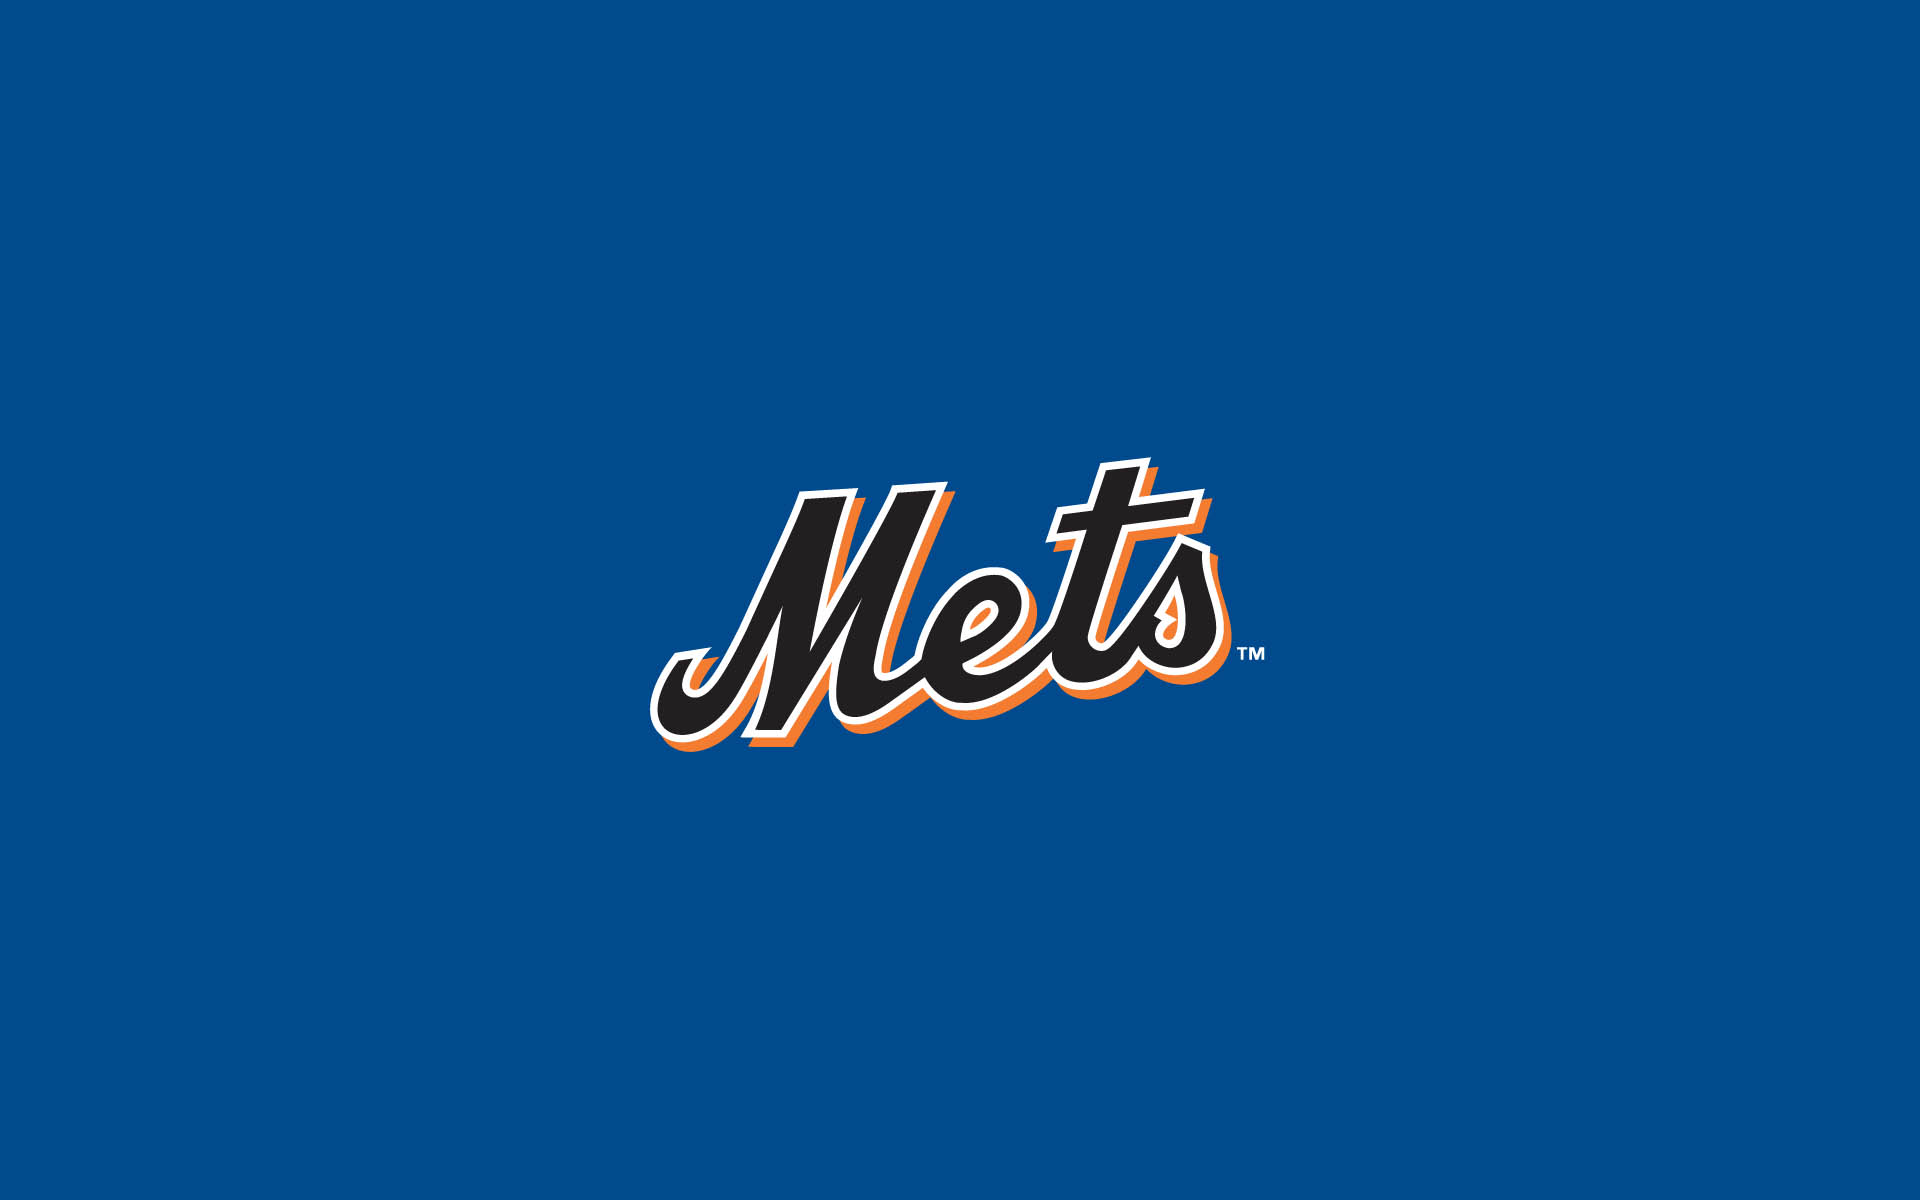 com http wallpaperspal com new york mets 2014 logo wallpaper 1920x1200